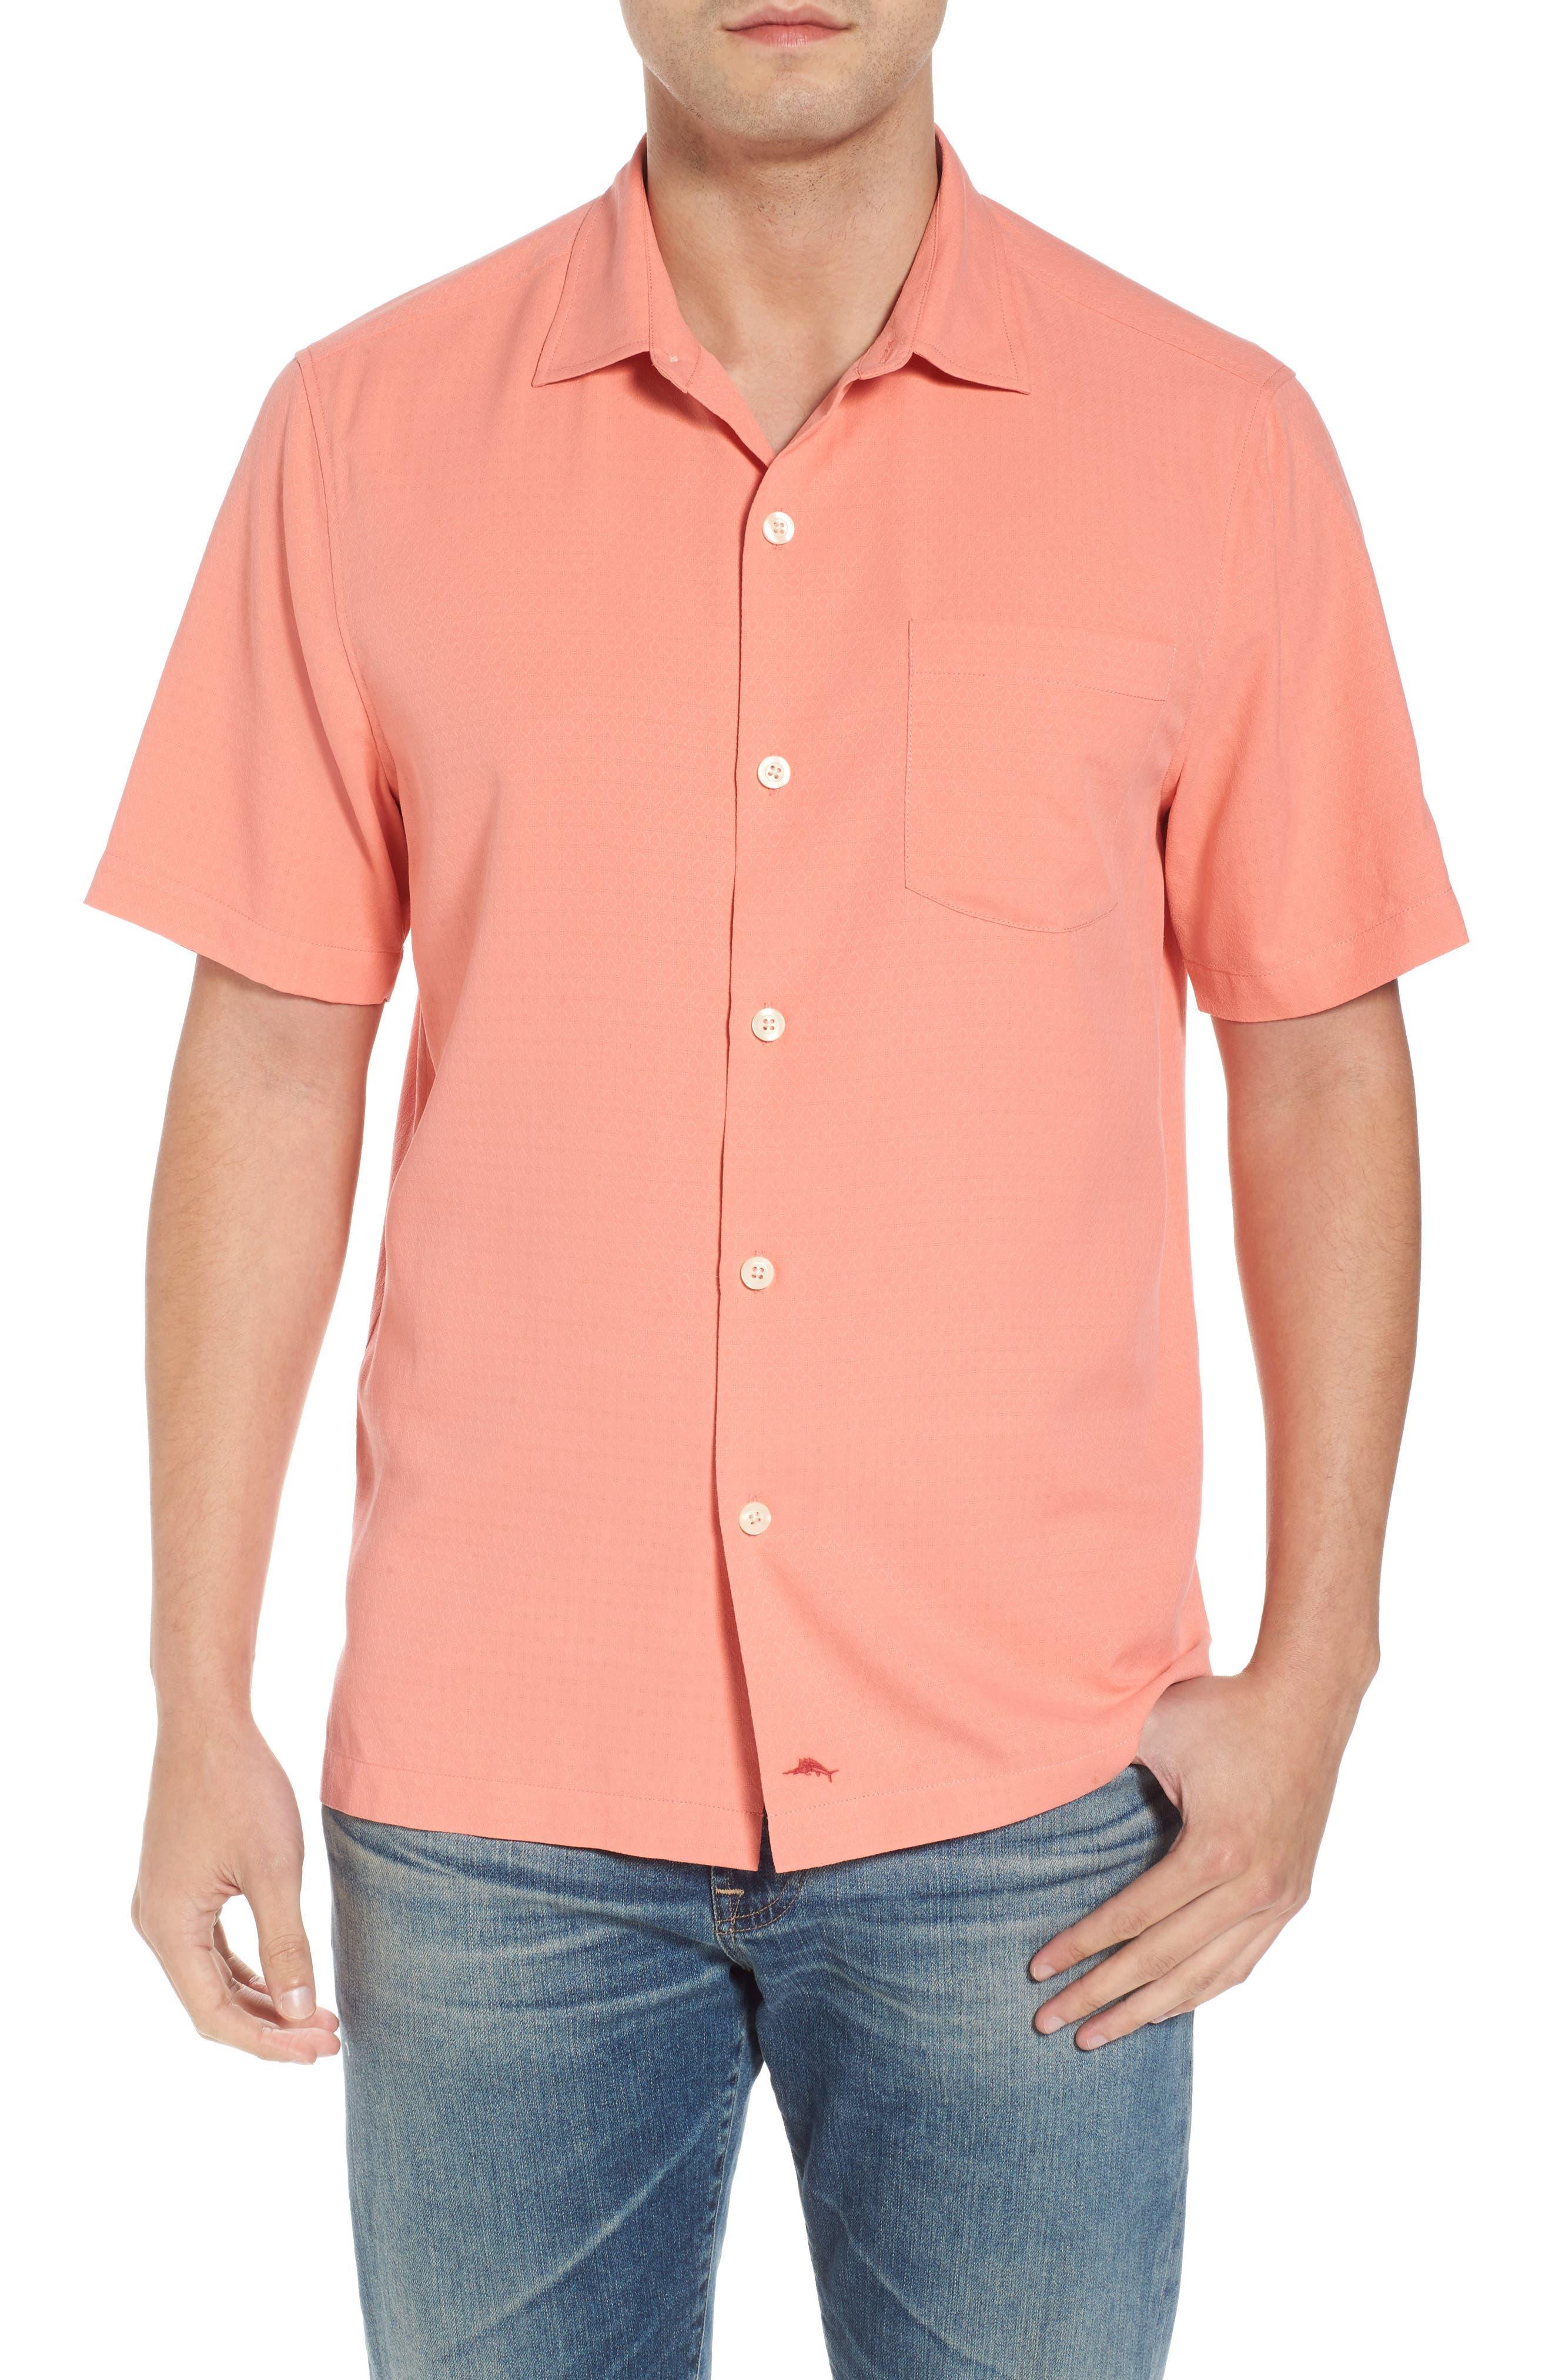 Main Image - Tommy Bahama Oasis Jacquard Silk Sport Shirt